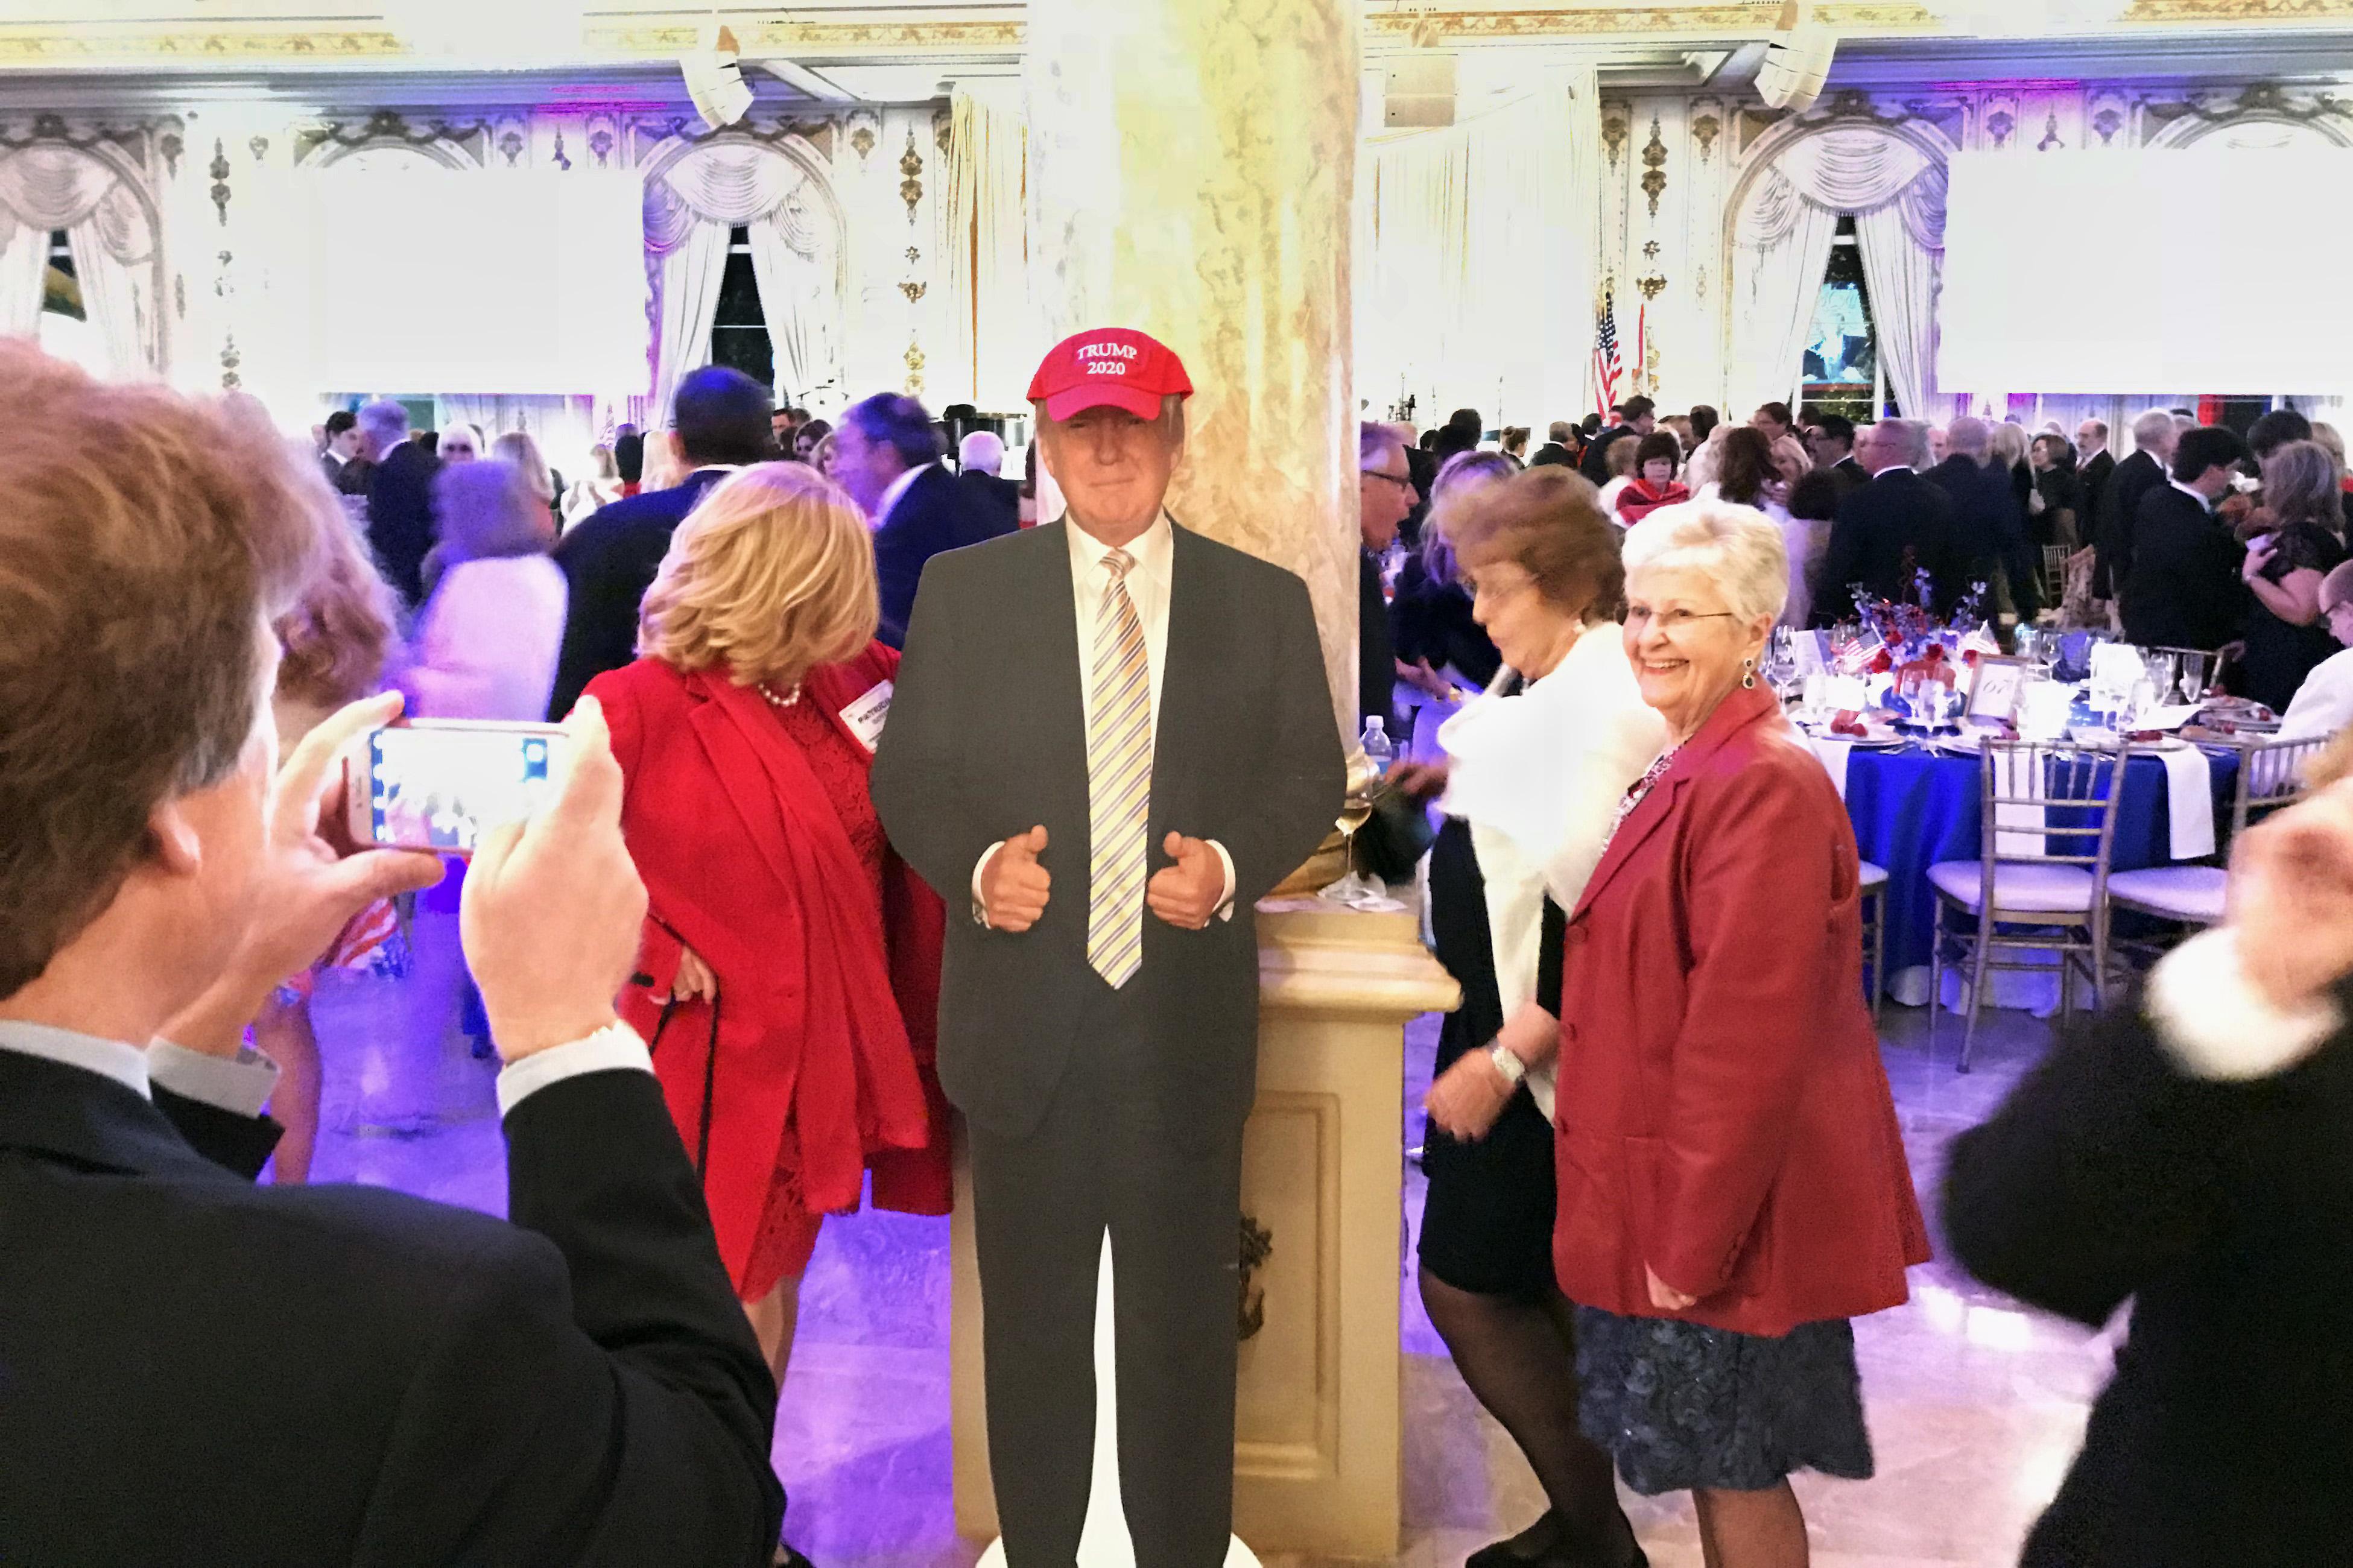 Mar O Lago Wedding Schedule December 2019 Calendar Most charities that deserted Trump's Florida club after